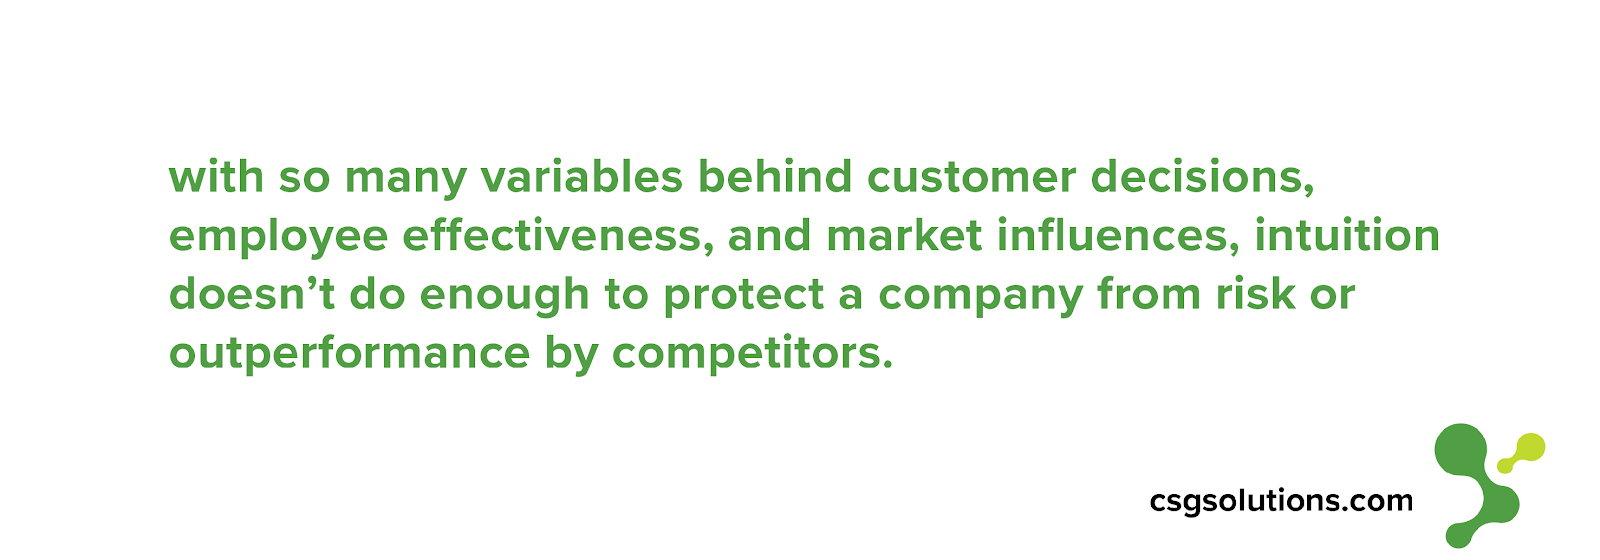 company risk and competitors